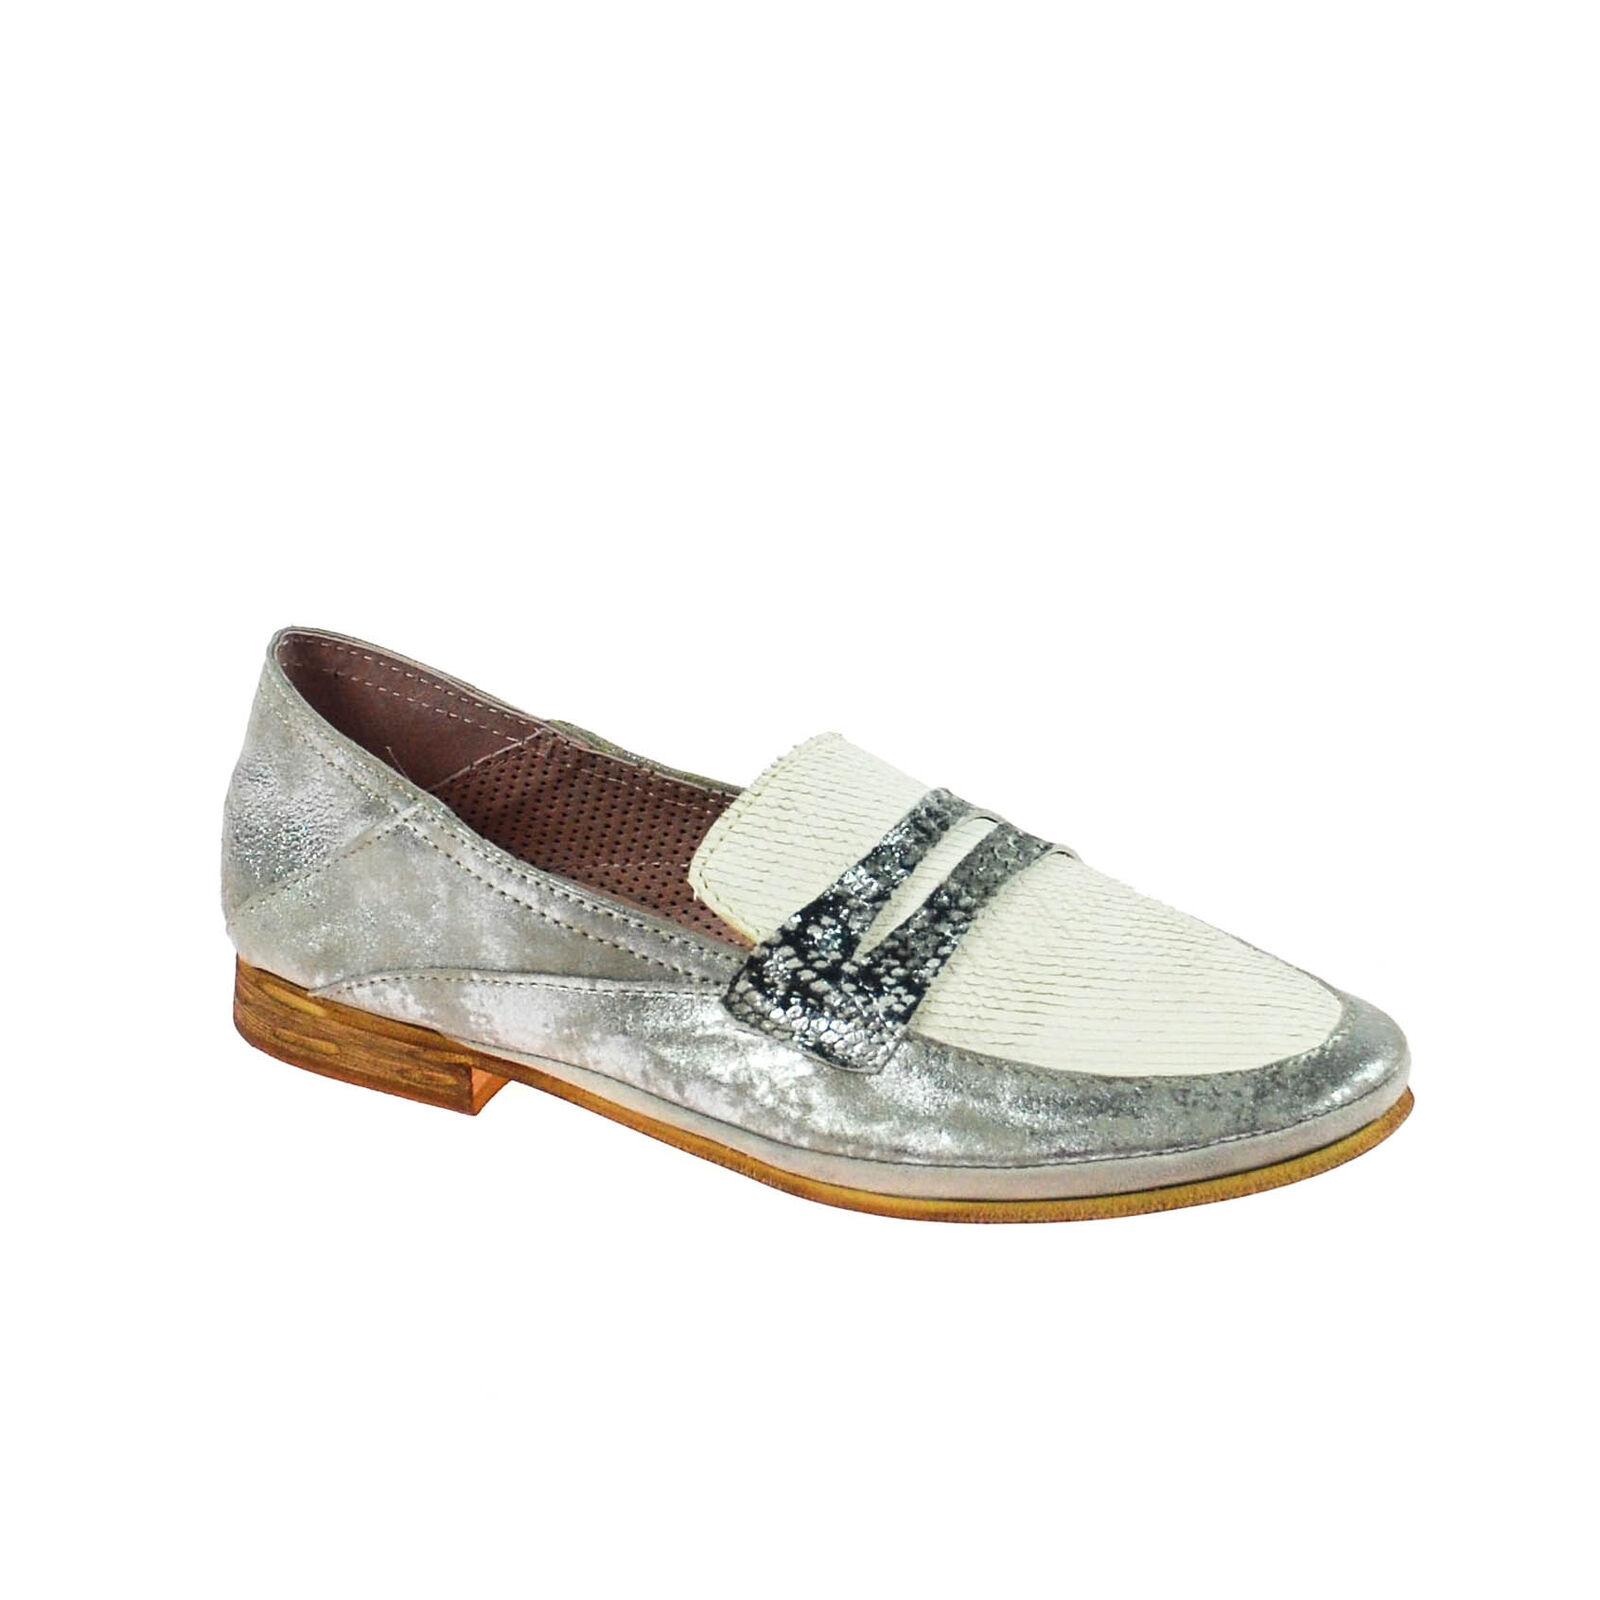 Gabor Shoes Fashion, (Pazifik/Ocean Sandali con Zeppa Donna, Blu (Pazifik/Ocean Fashion, 16), (M8s) 8cf9e8